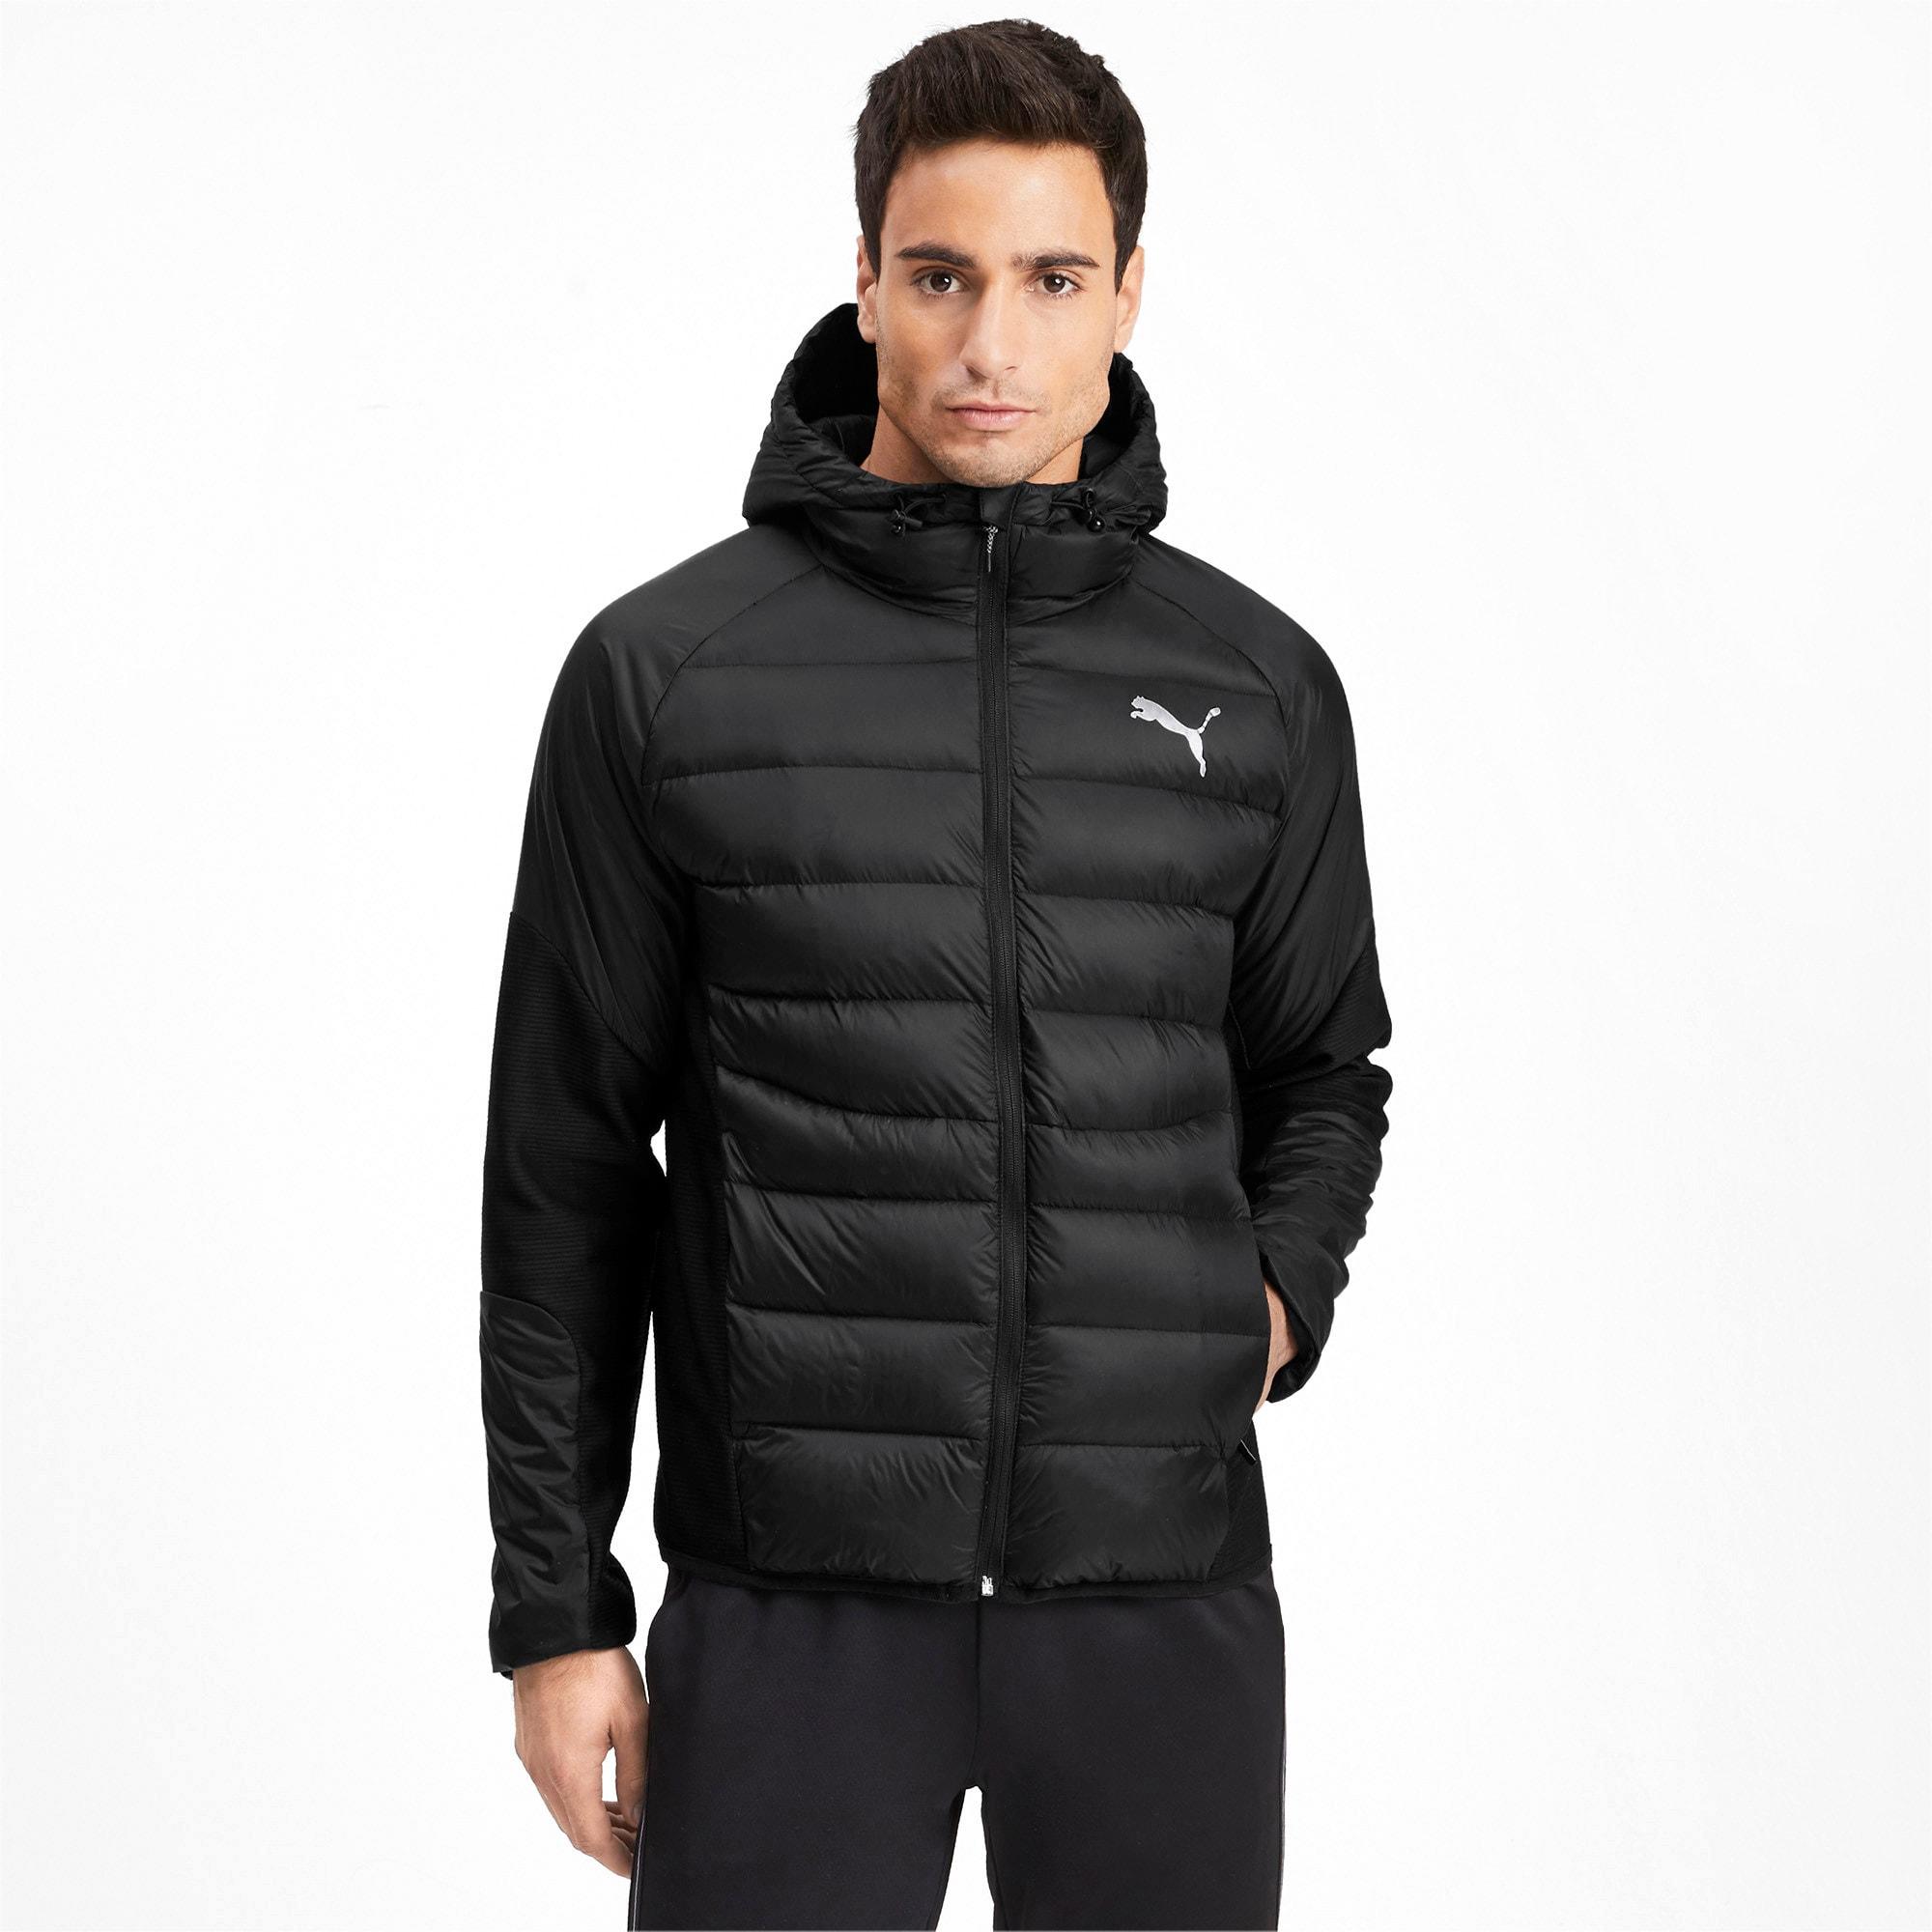 Thumbnail 1 of 600 Hybrid Down Men's Jacket, Puma Black, medium